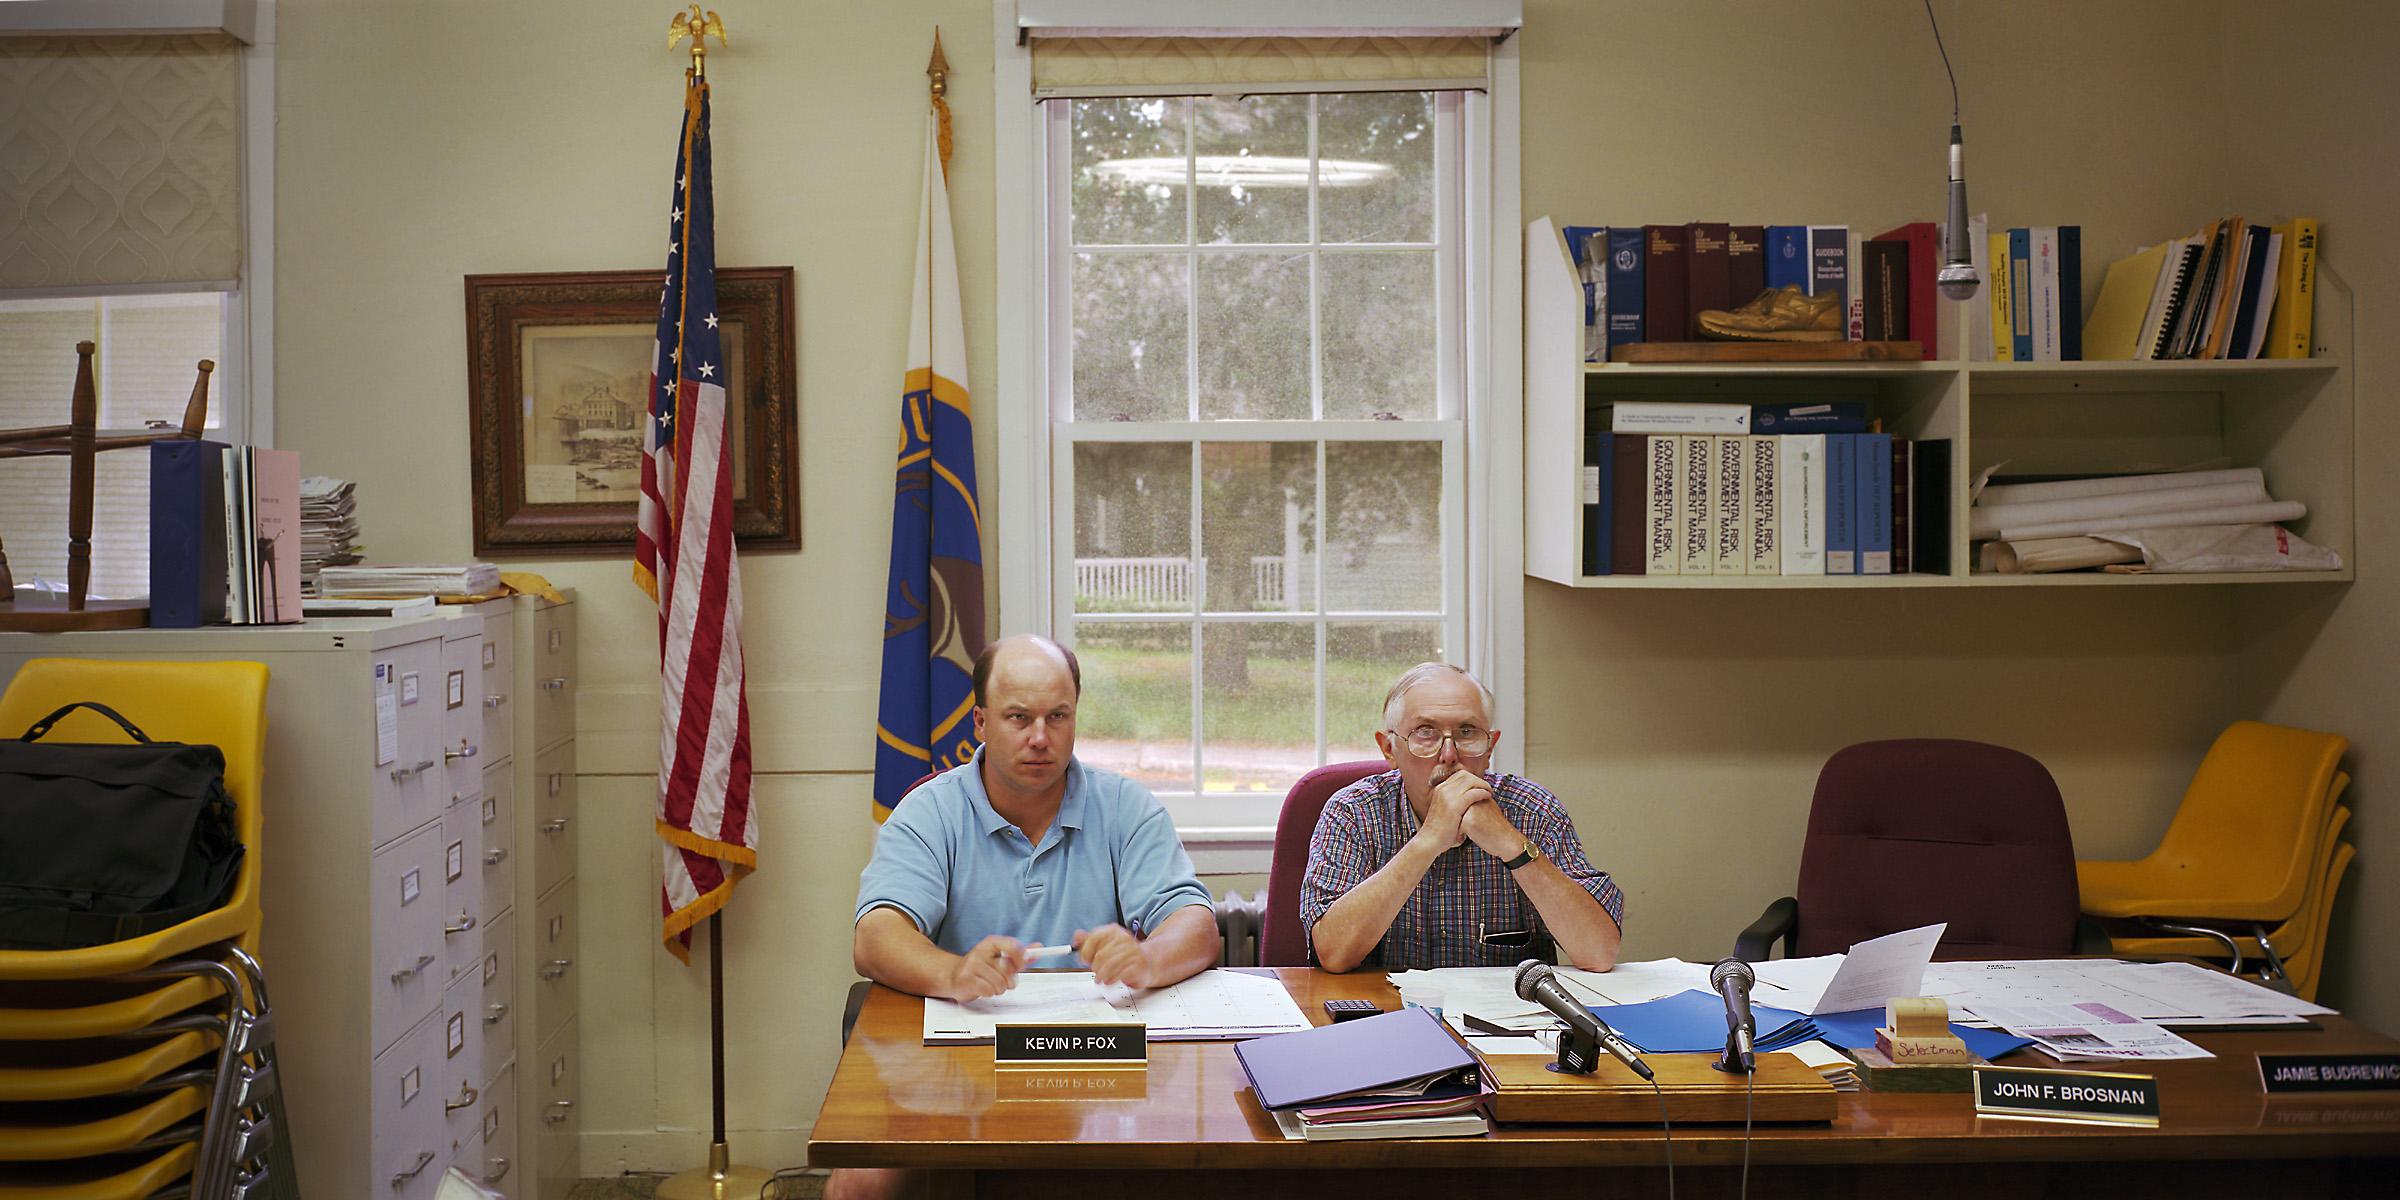 Buckland, Massachusetts (population 1,943) Board of Selectmen, July 27, 1999 (L to R): Kevin P. Fox, John F. Brosnan (Chair), 1999.